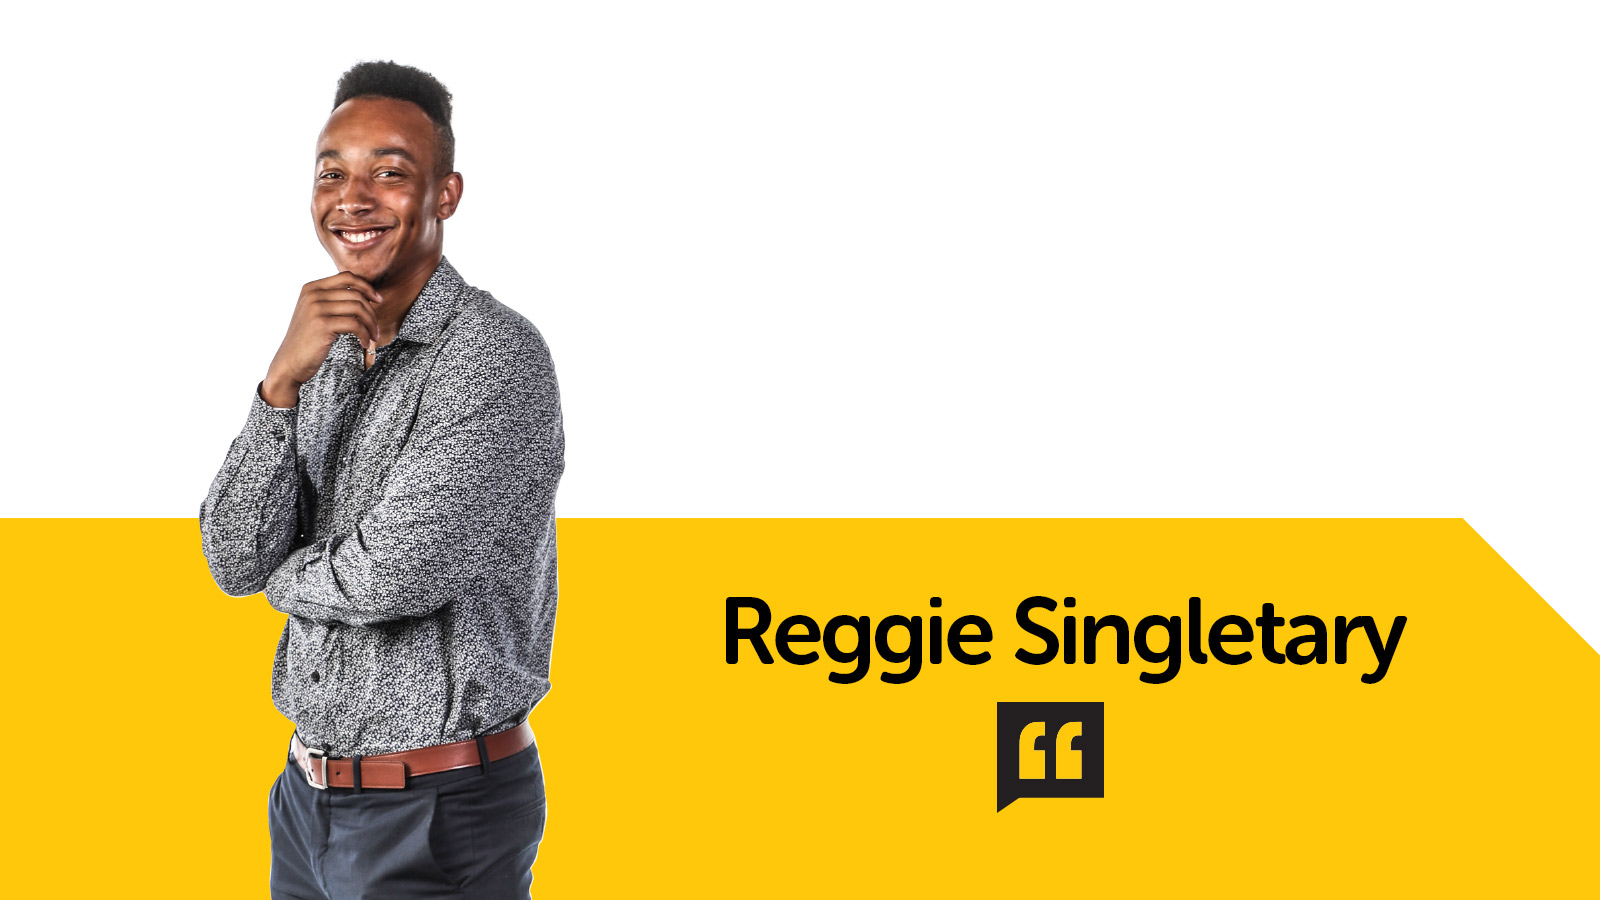 Singletary